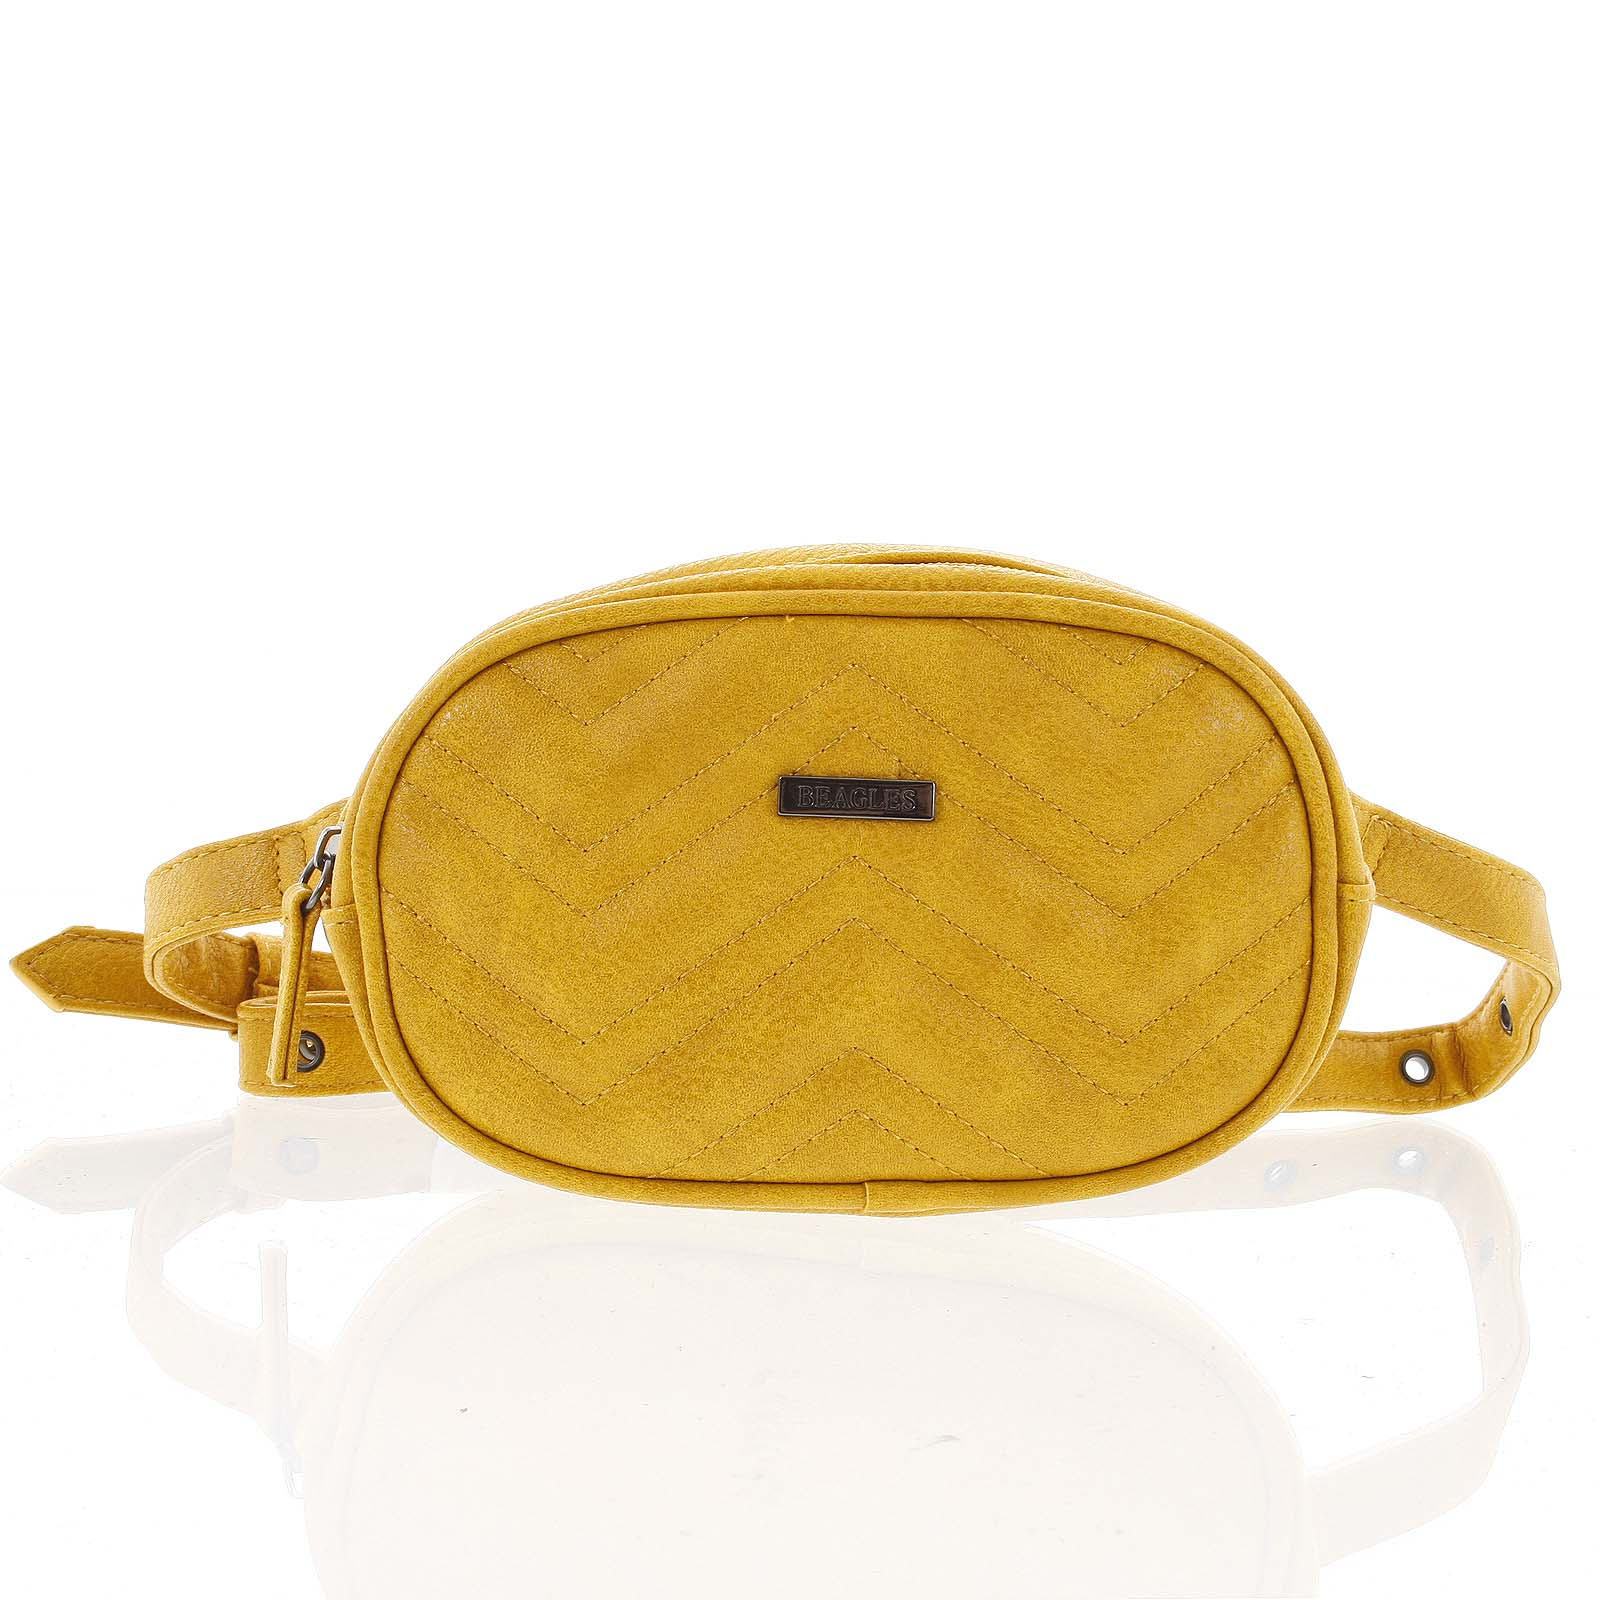 Malá dámska crossbody kabelka / ľadvinka žltá - Beagles Tima